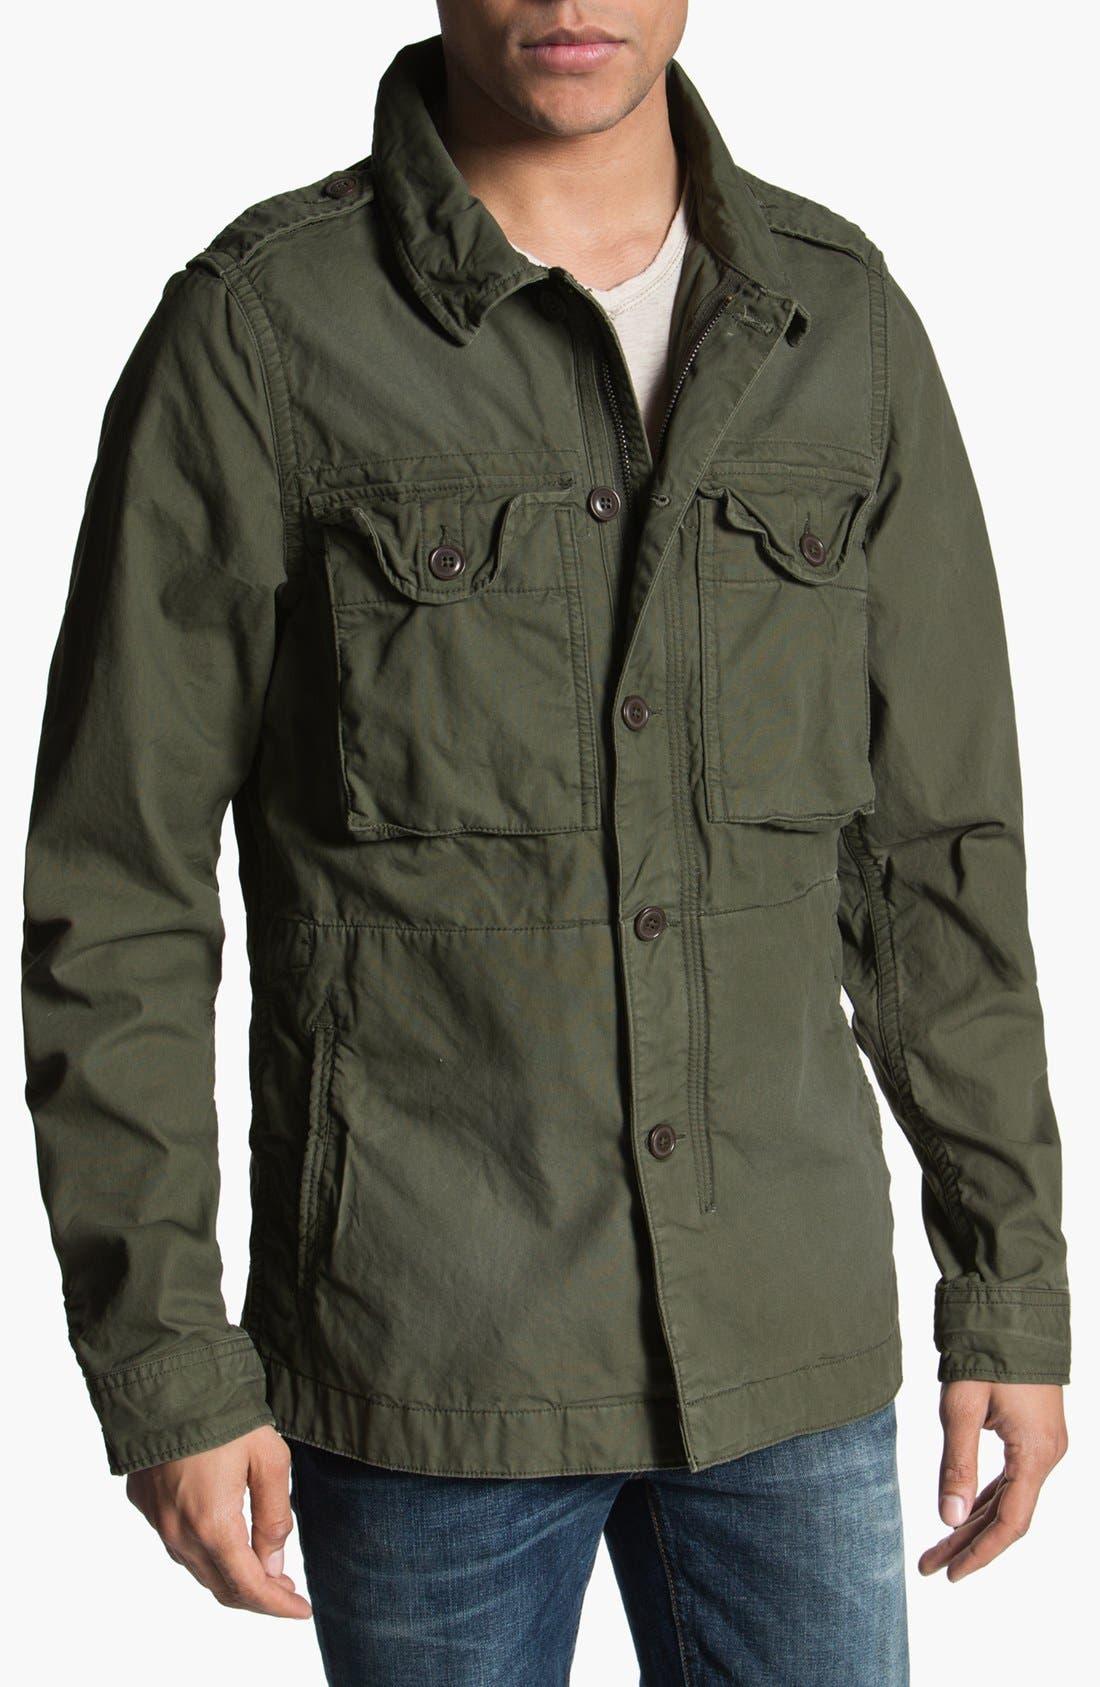 Alternate Image 1 Selected - Relwen Canvas Field Jacket